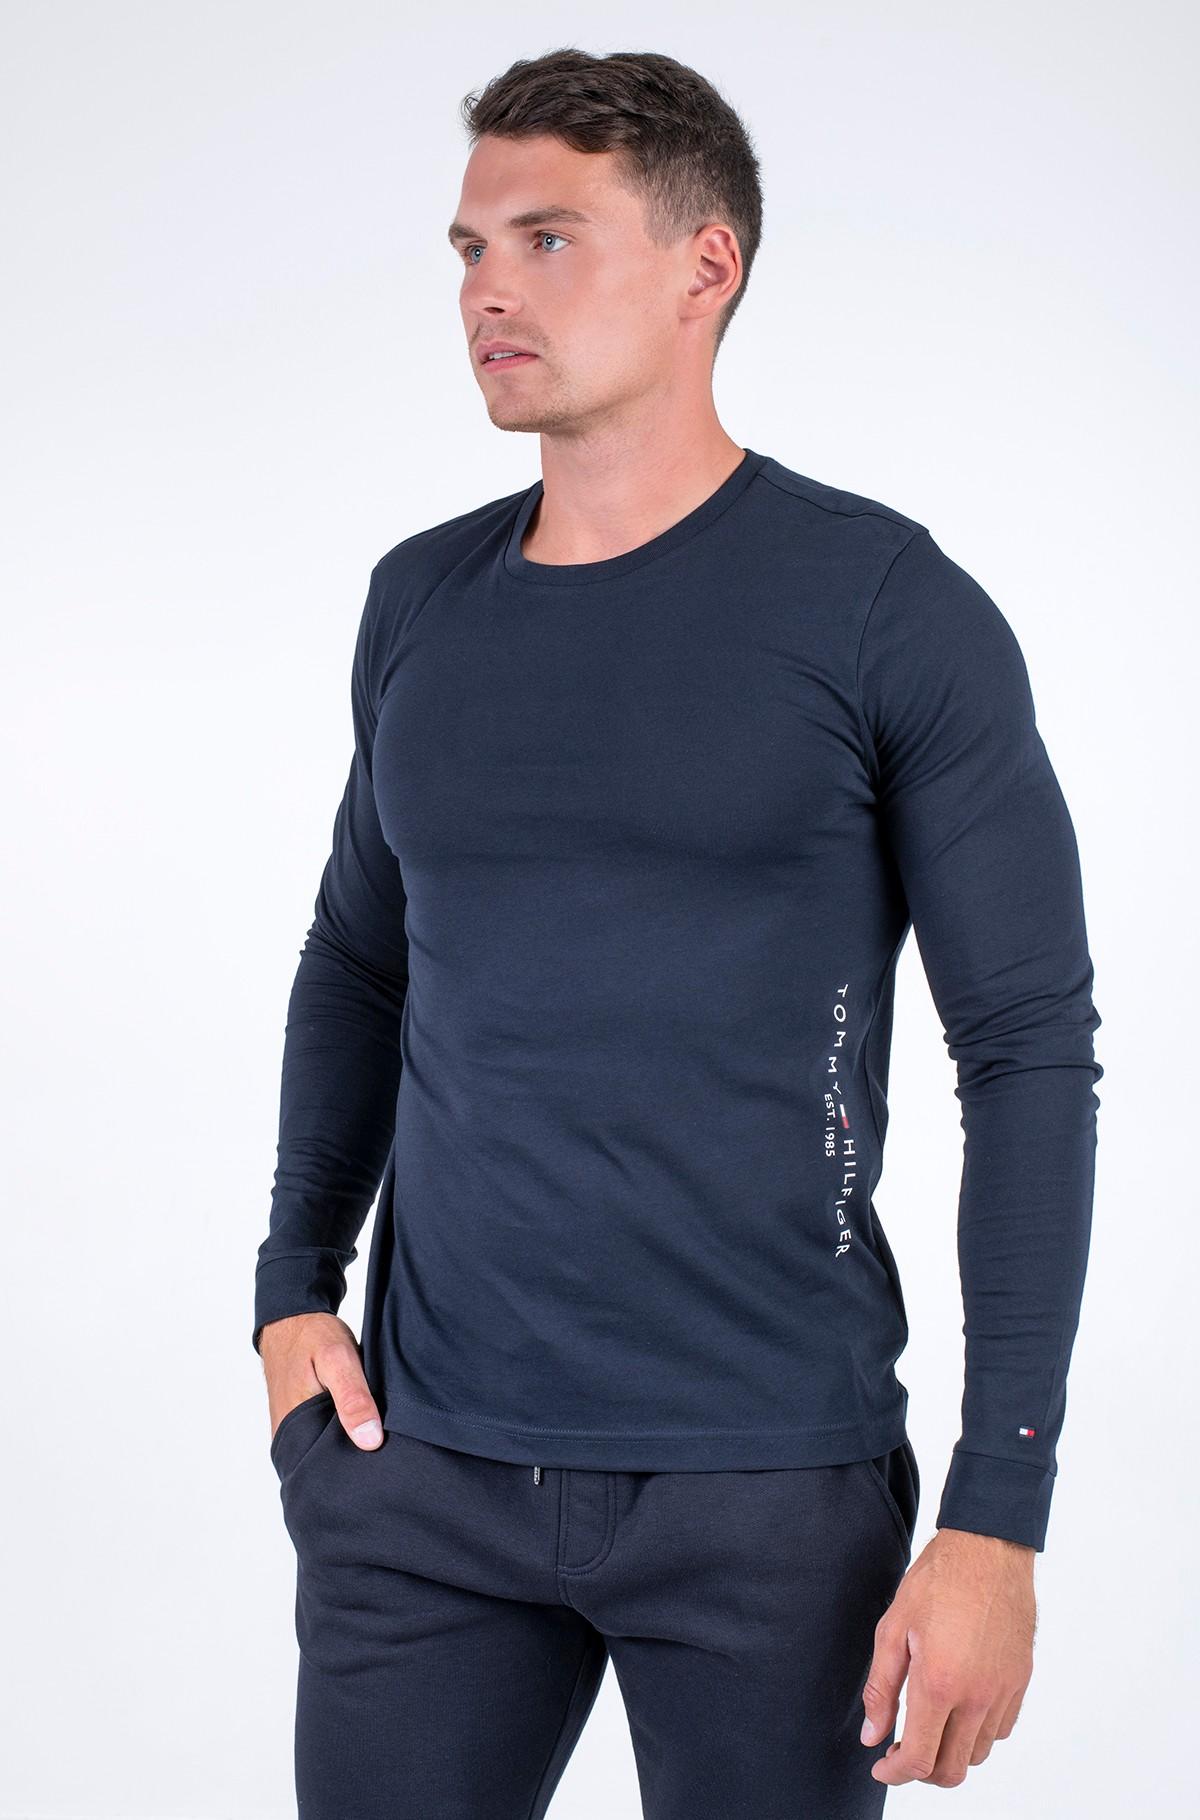 T-krekls ar garām piedurknēm  HILFIGER LOGO LONG SLEEVE TEE-full-1